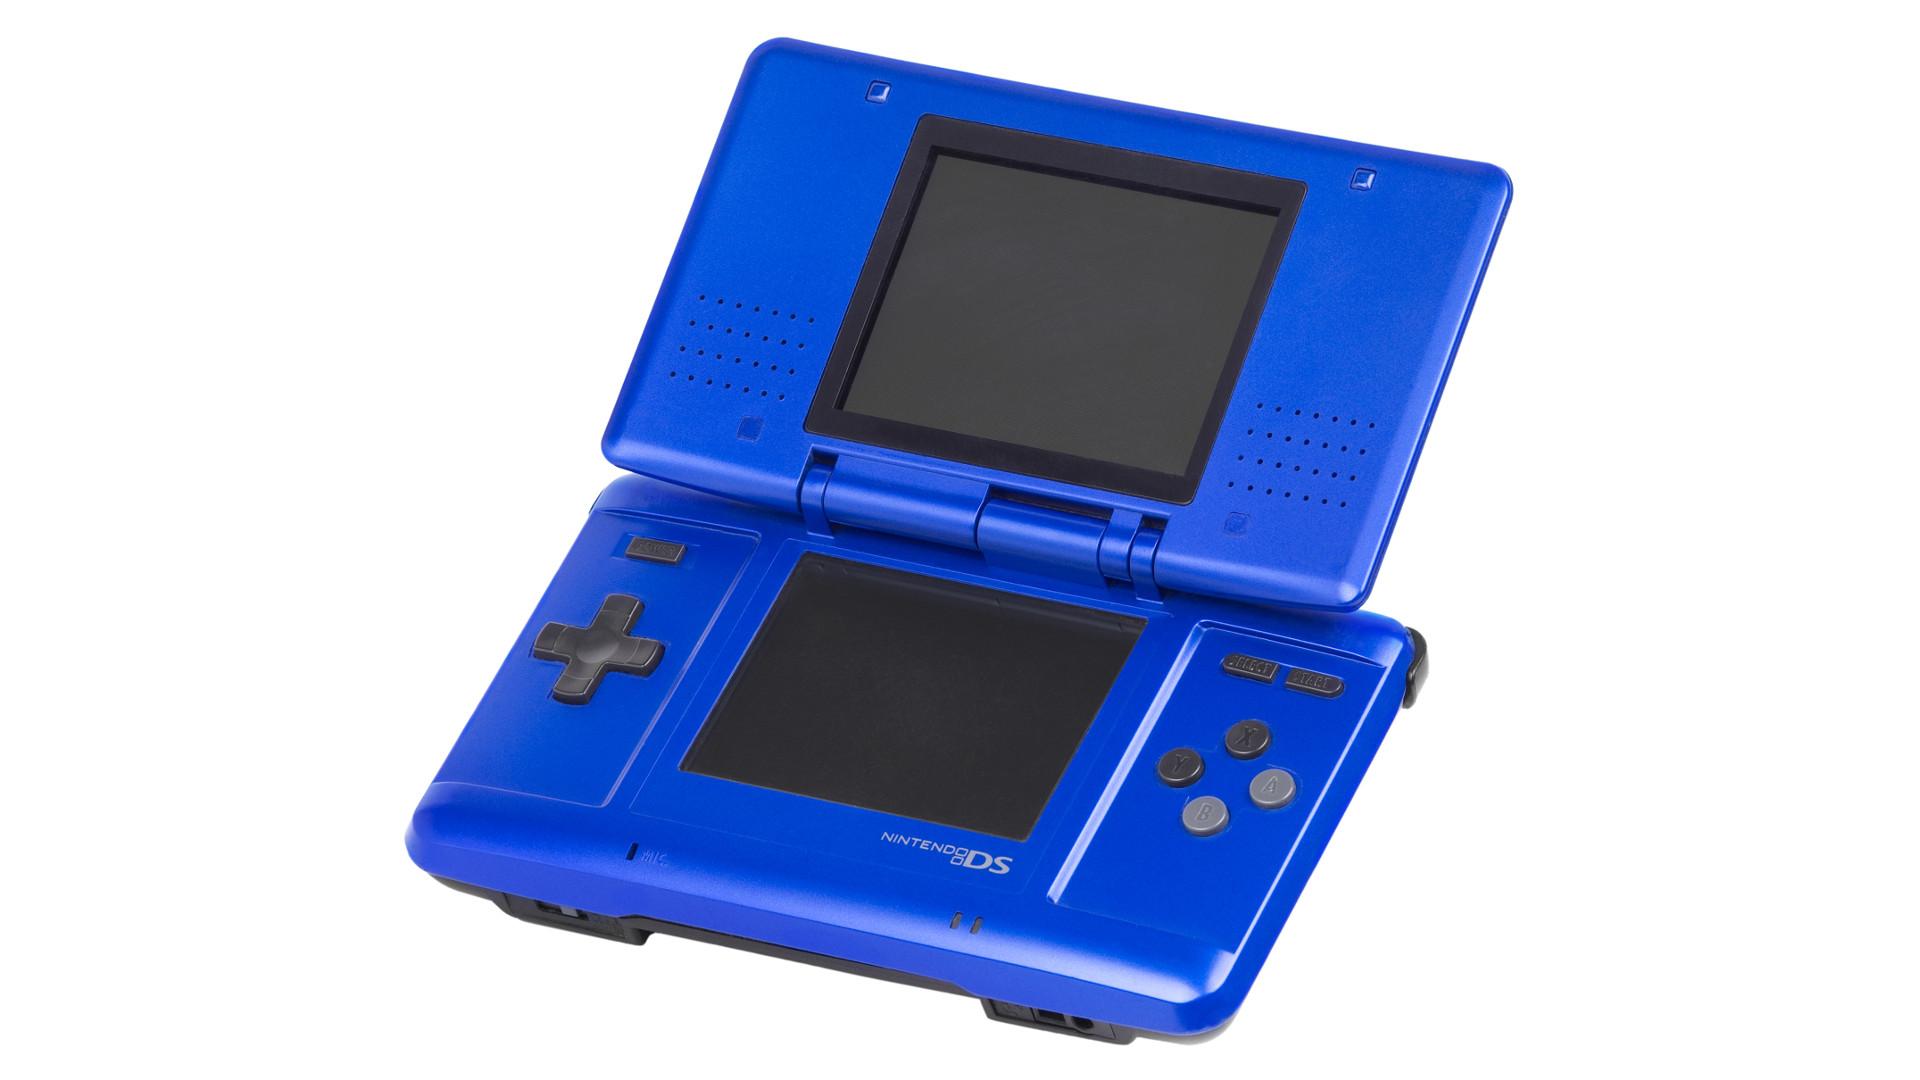 Nintendo DS in blue, open.